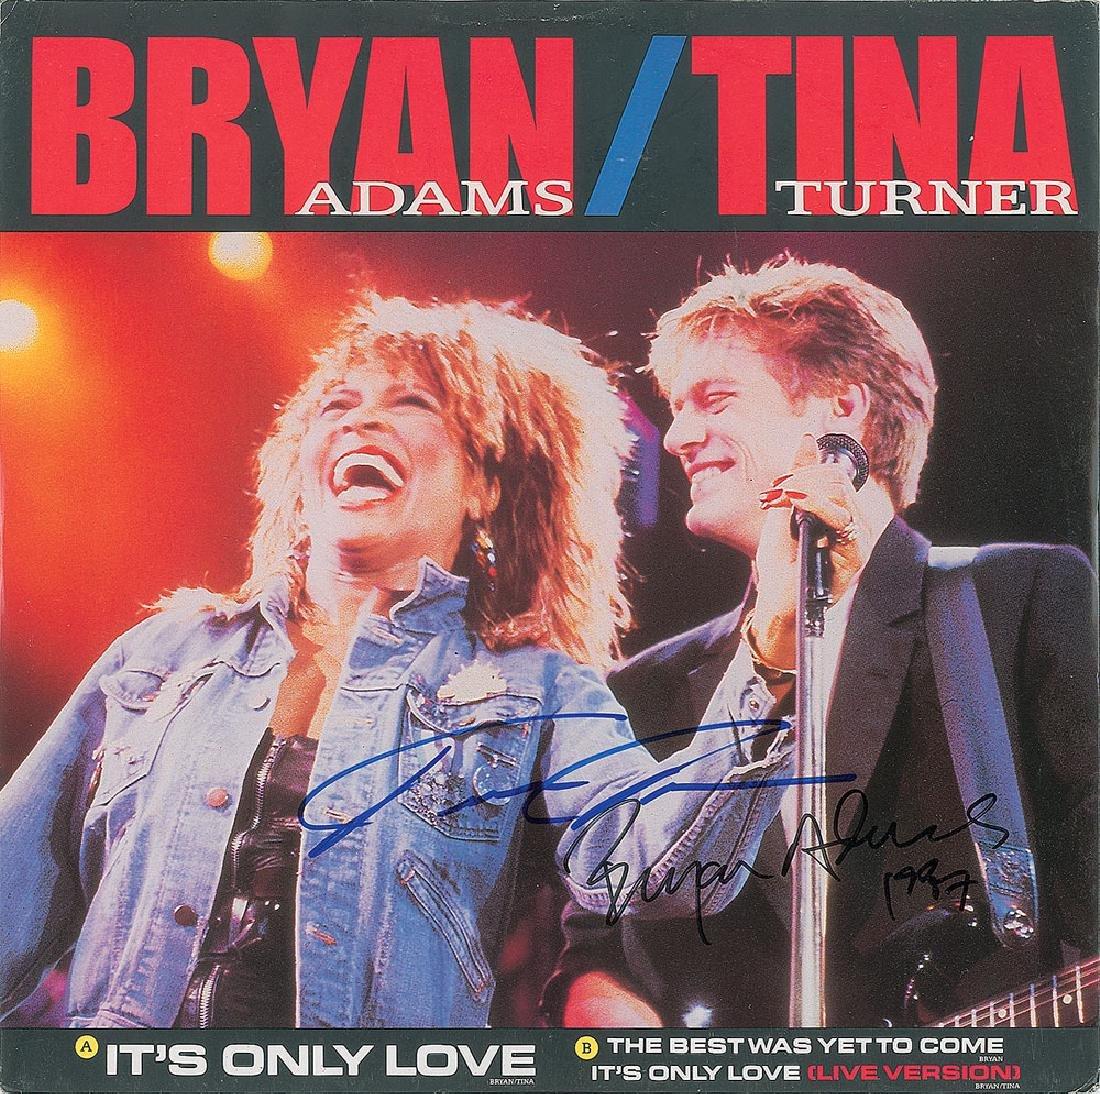 Bryan Adams and Tina Turner Signed Album